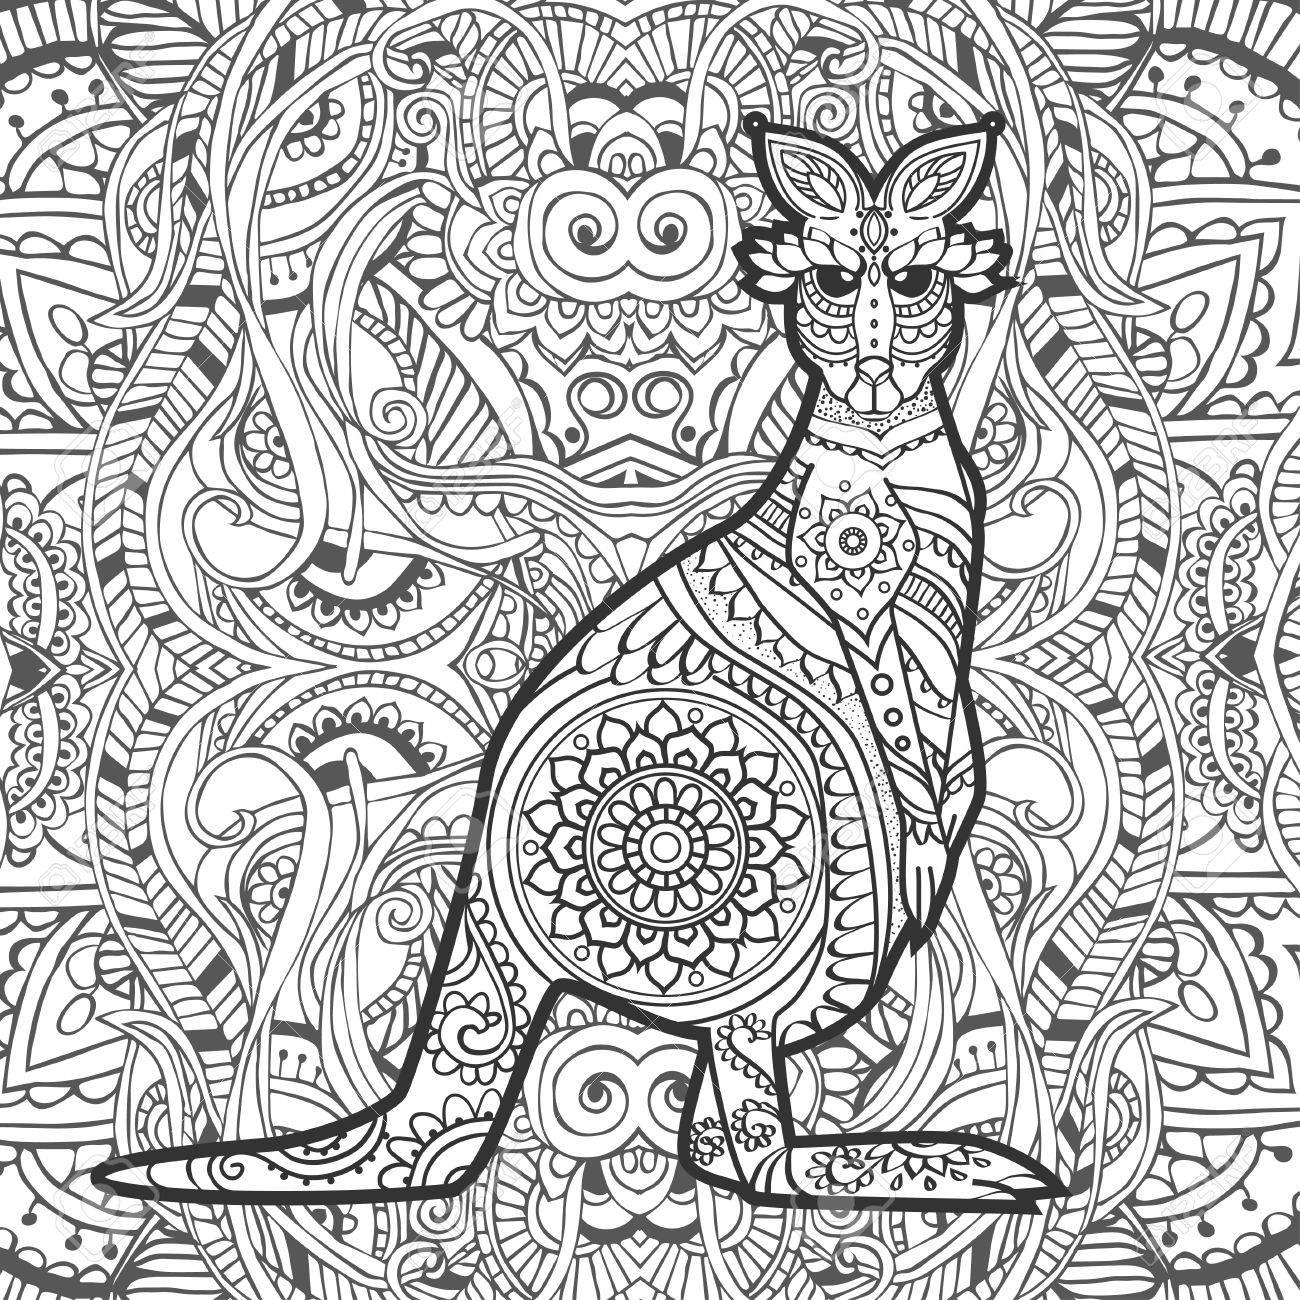 Coloriage Mandala Kangourou.Vecteur De Kangourou D Ornement Belle Illustration Kangourou Pour